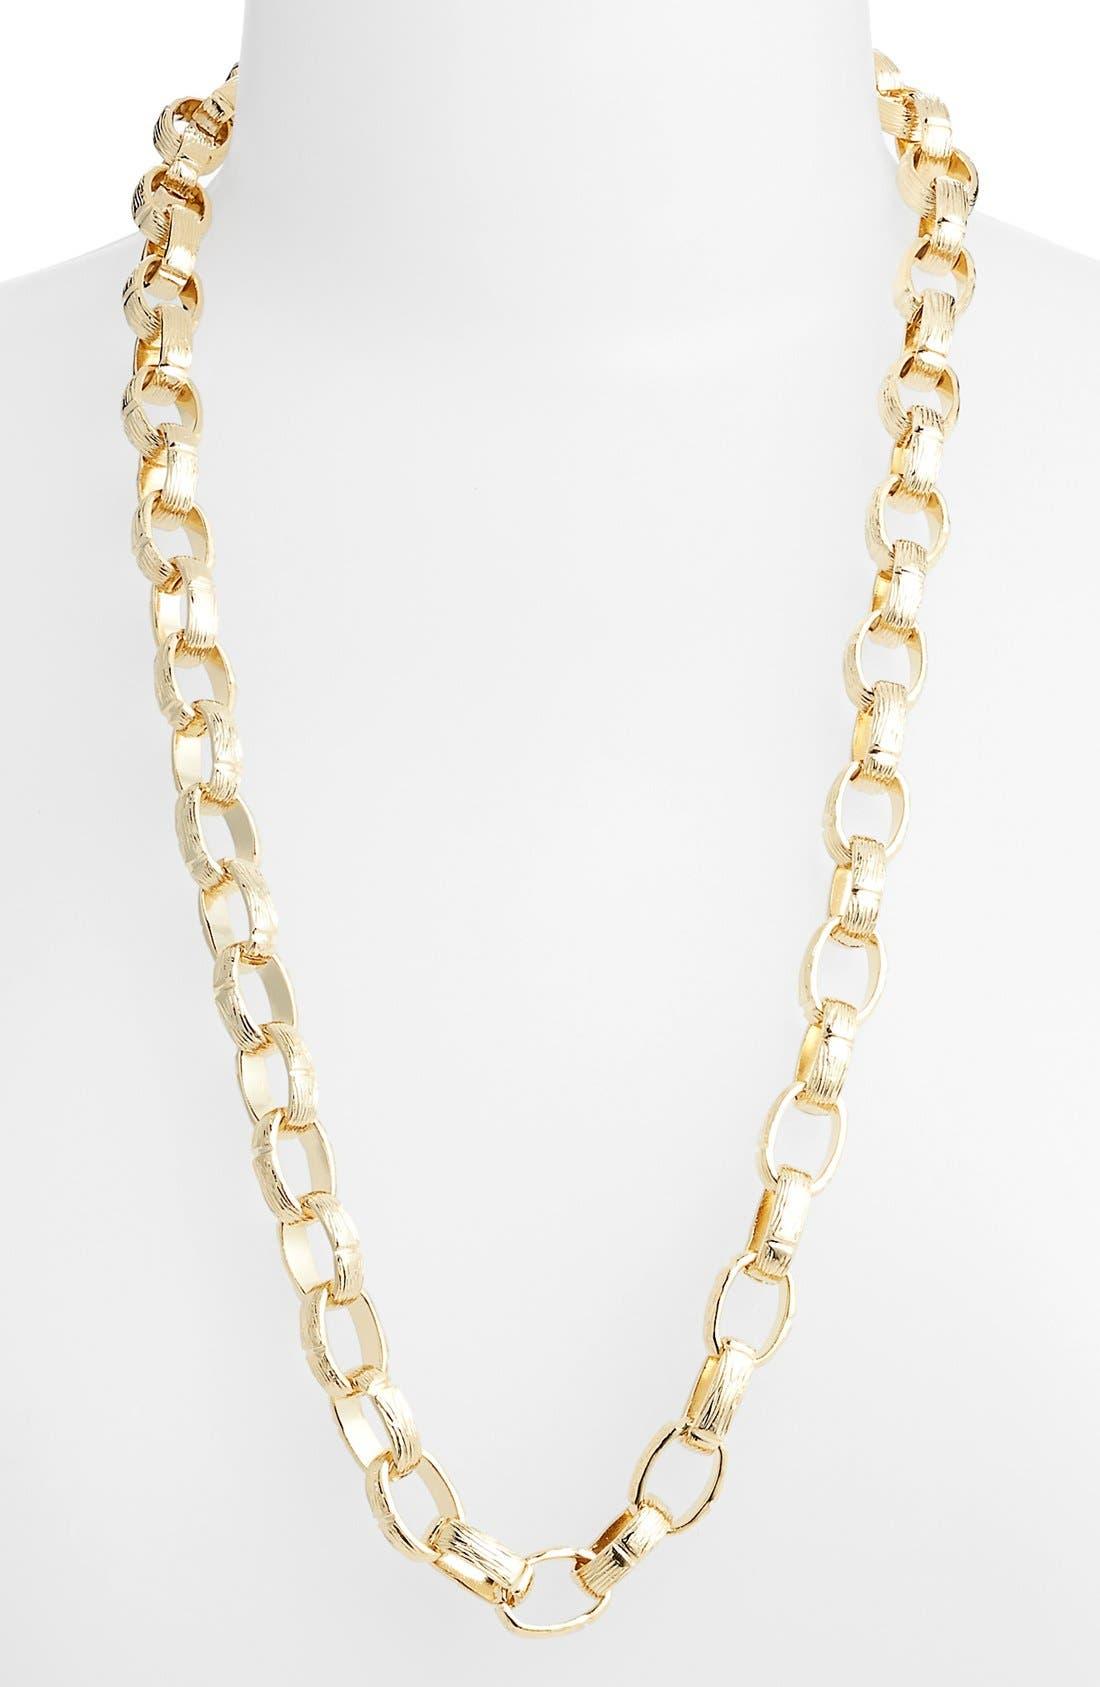 Alternate Image 1 Selected - Nordstrom Long Textured Link Necklace